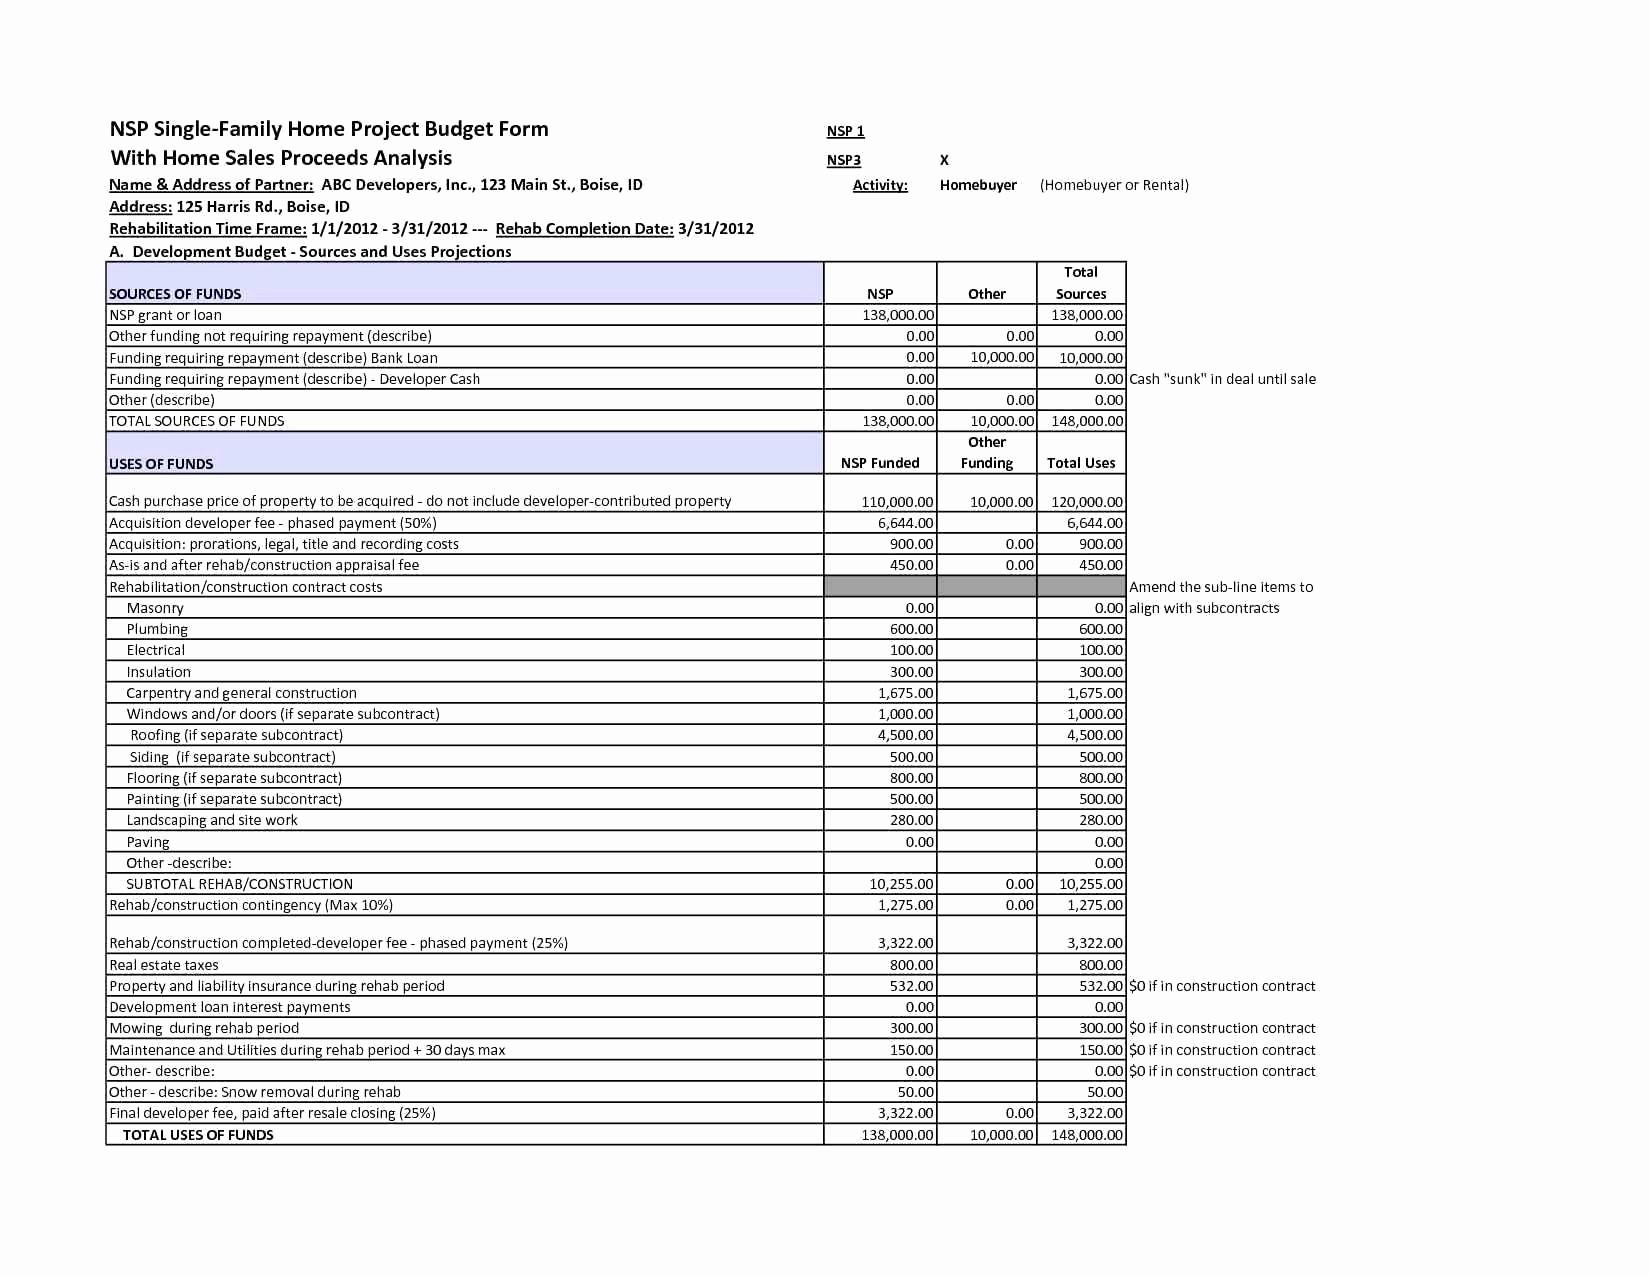 Nist Sp 800 171 Spreadsheet Within Nist Sp 800 171